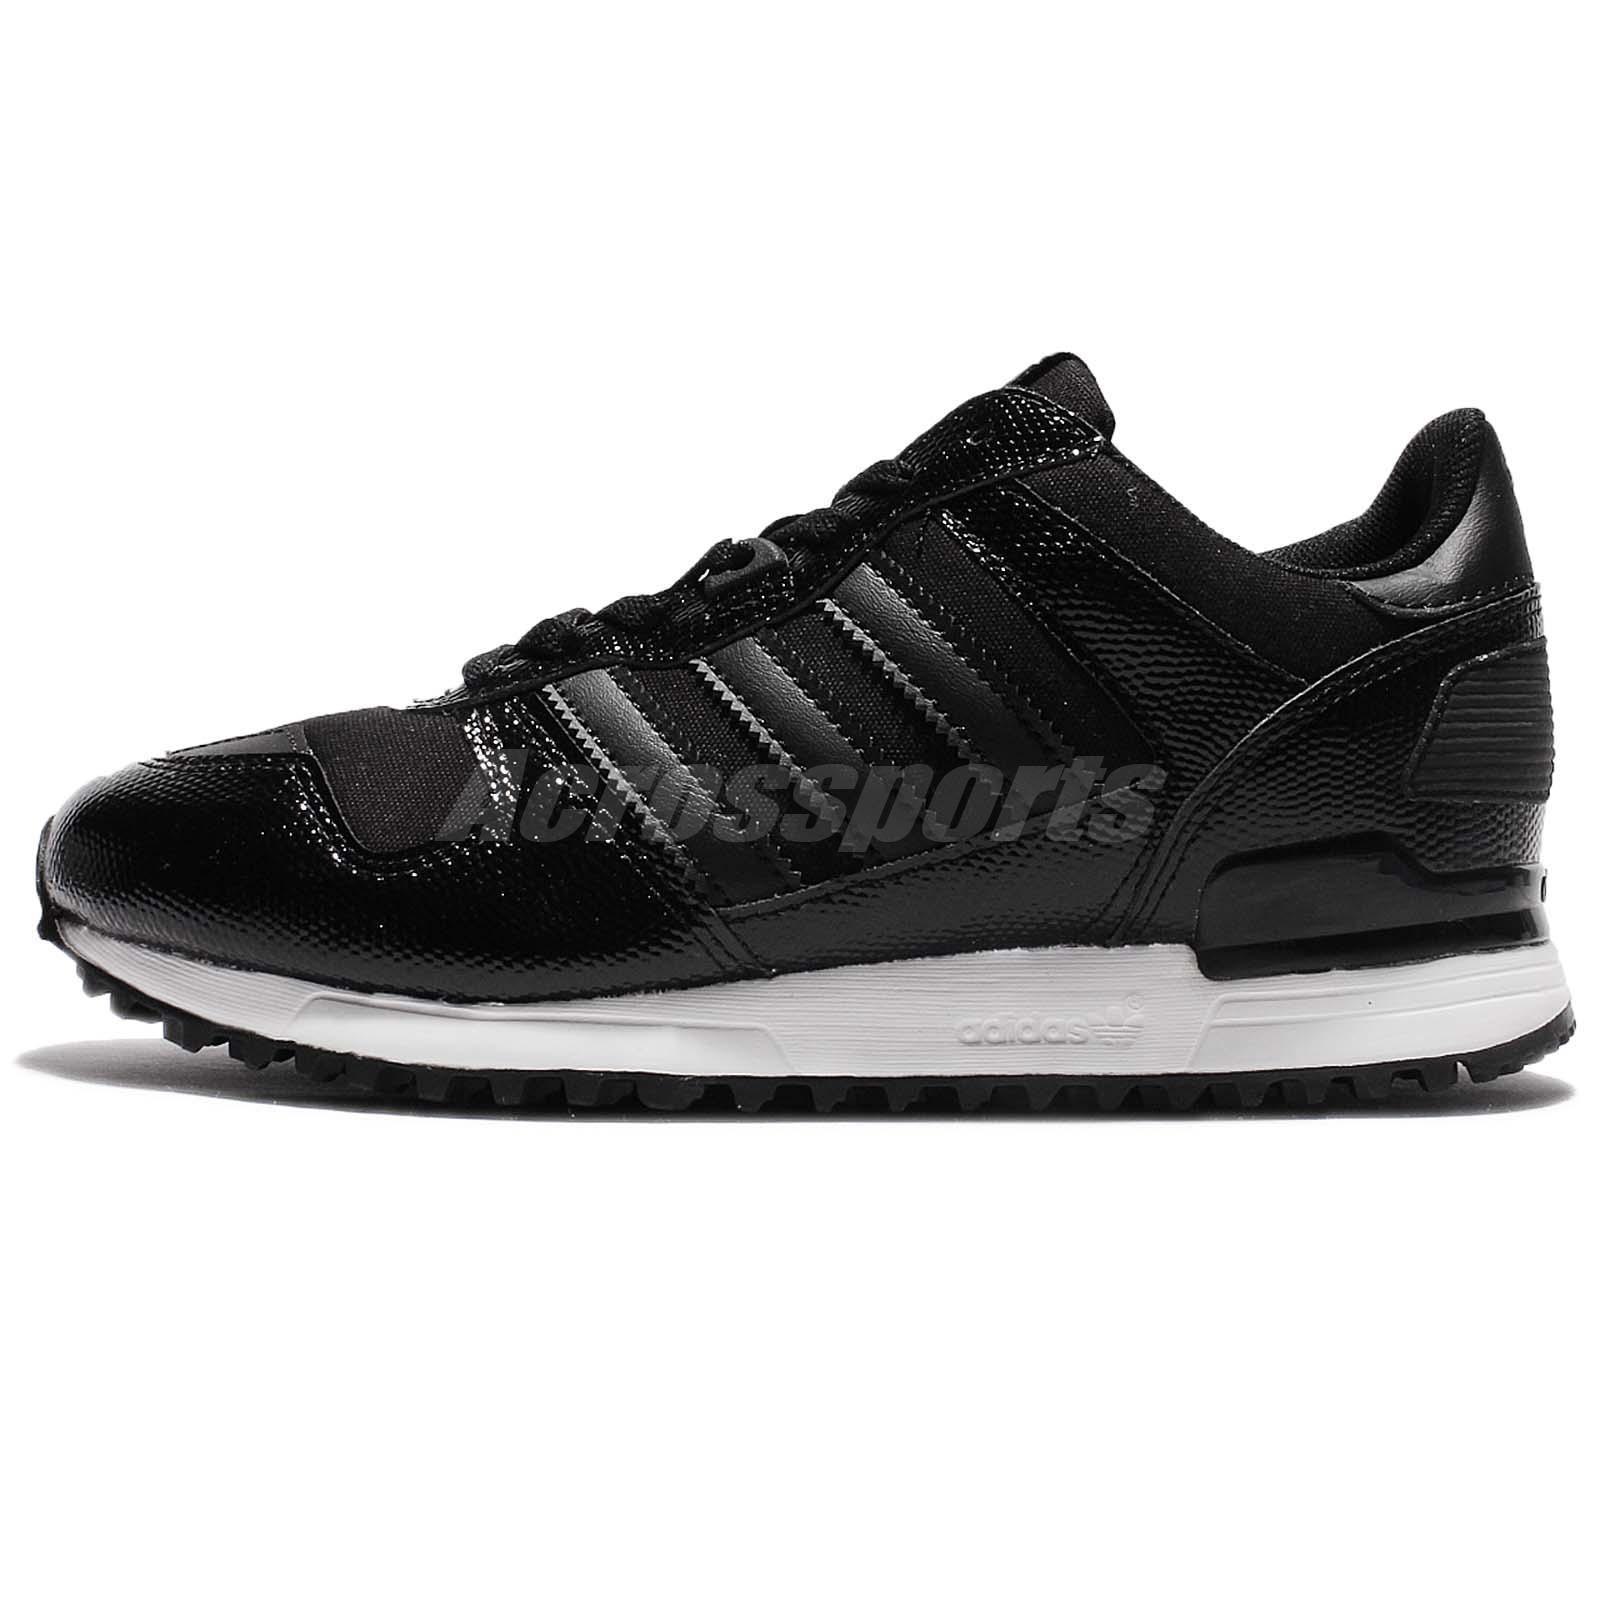 adidas originals zx 700 black